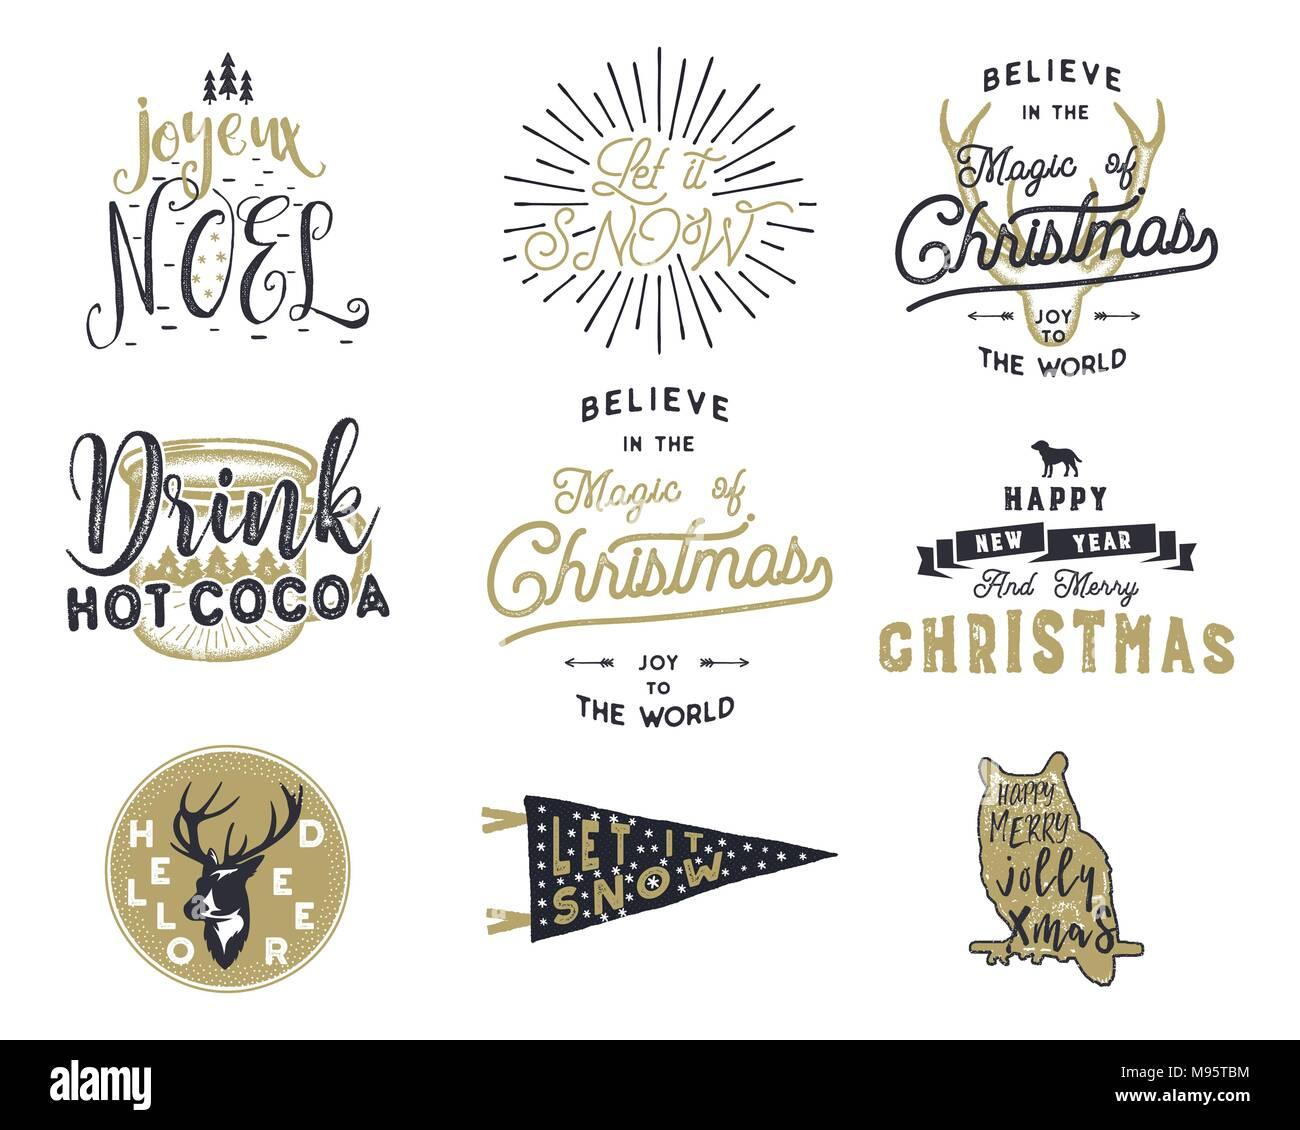 Big Merry Christmas Typography Quotes Wishes Bundle Sunbursts